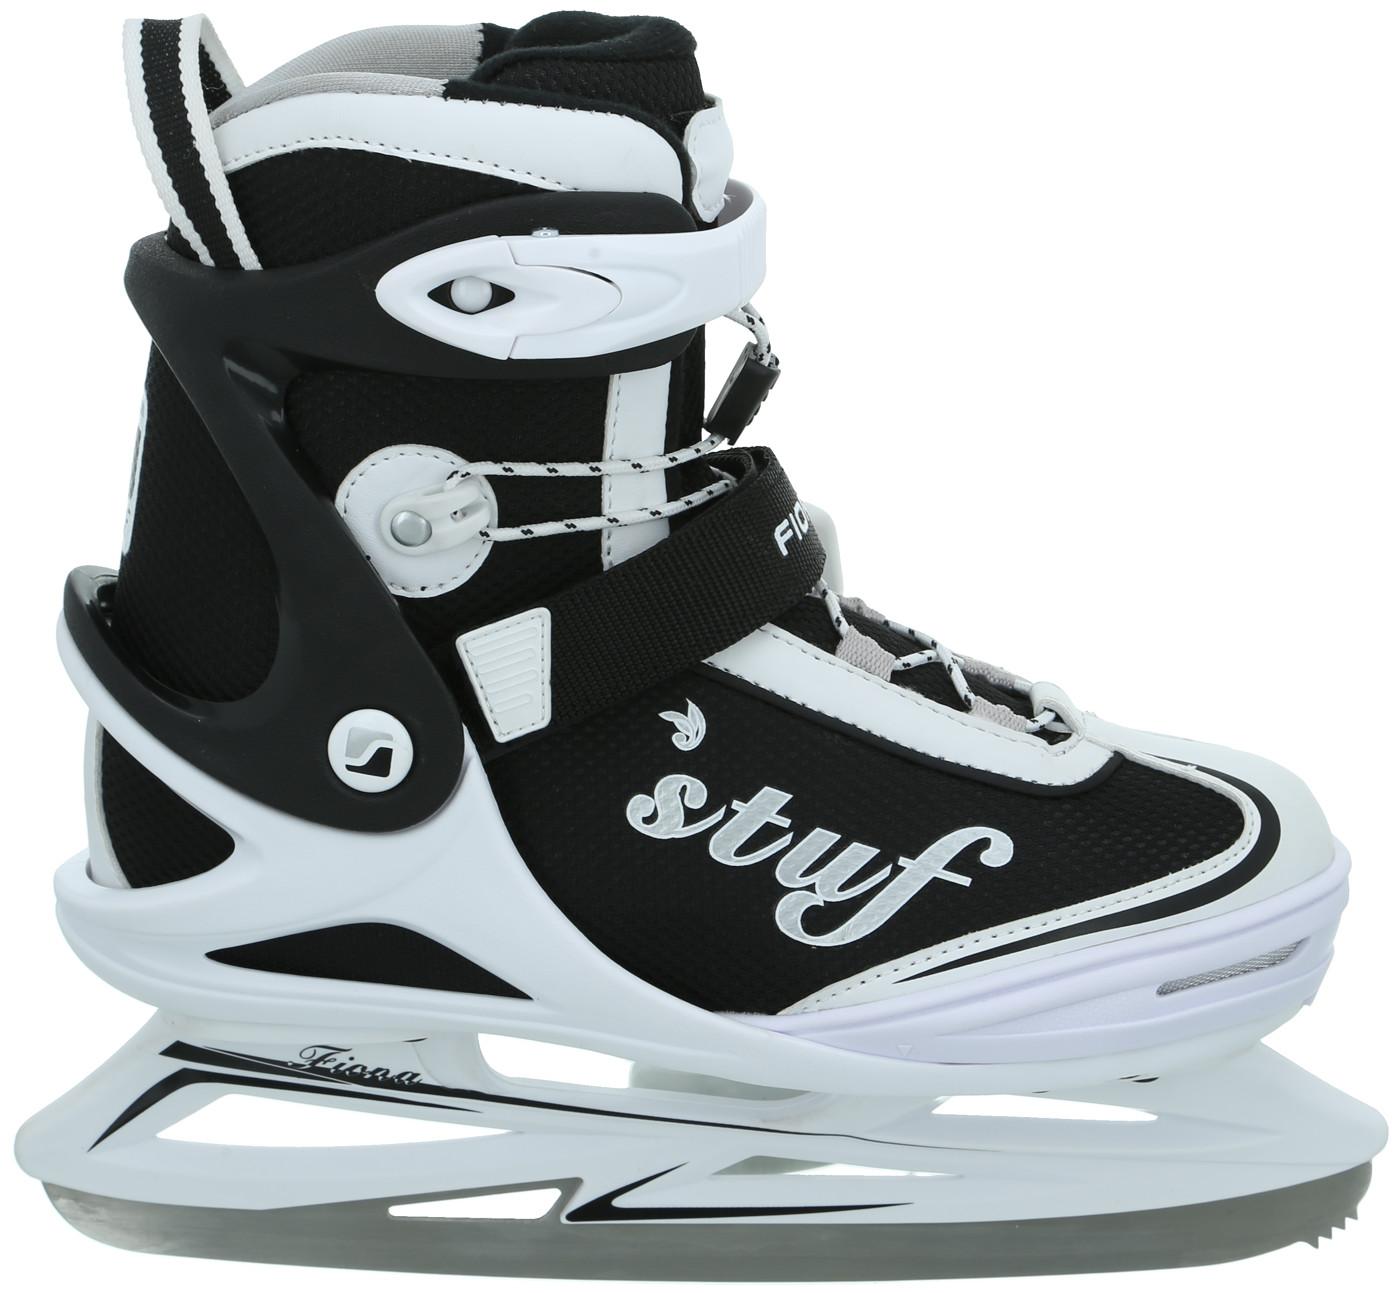 STUF figure ice skate FIONA LADY - Damen